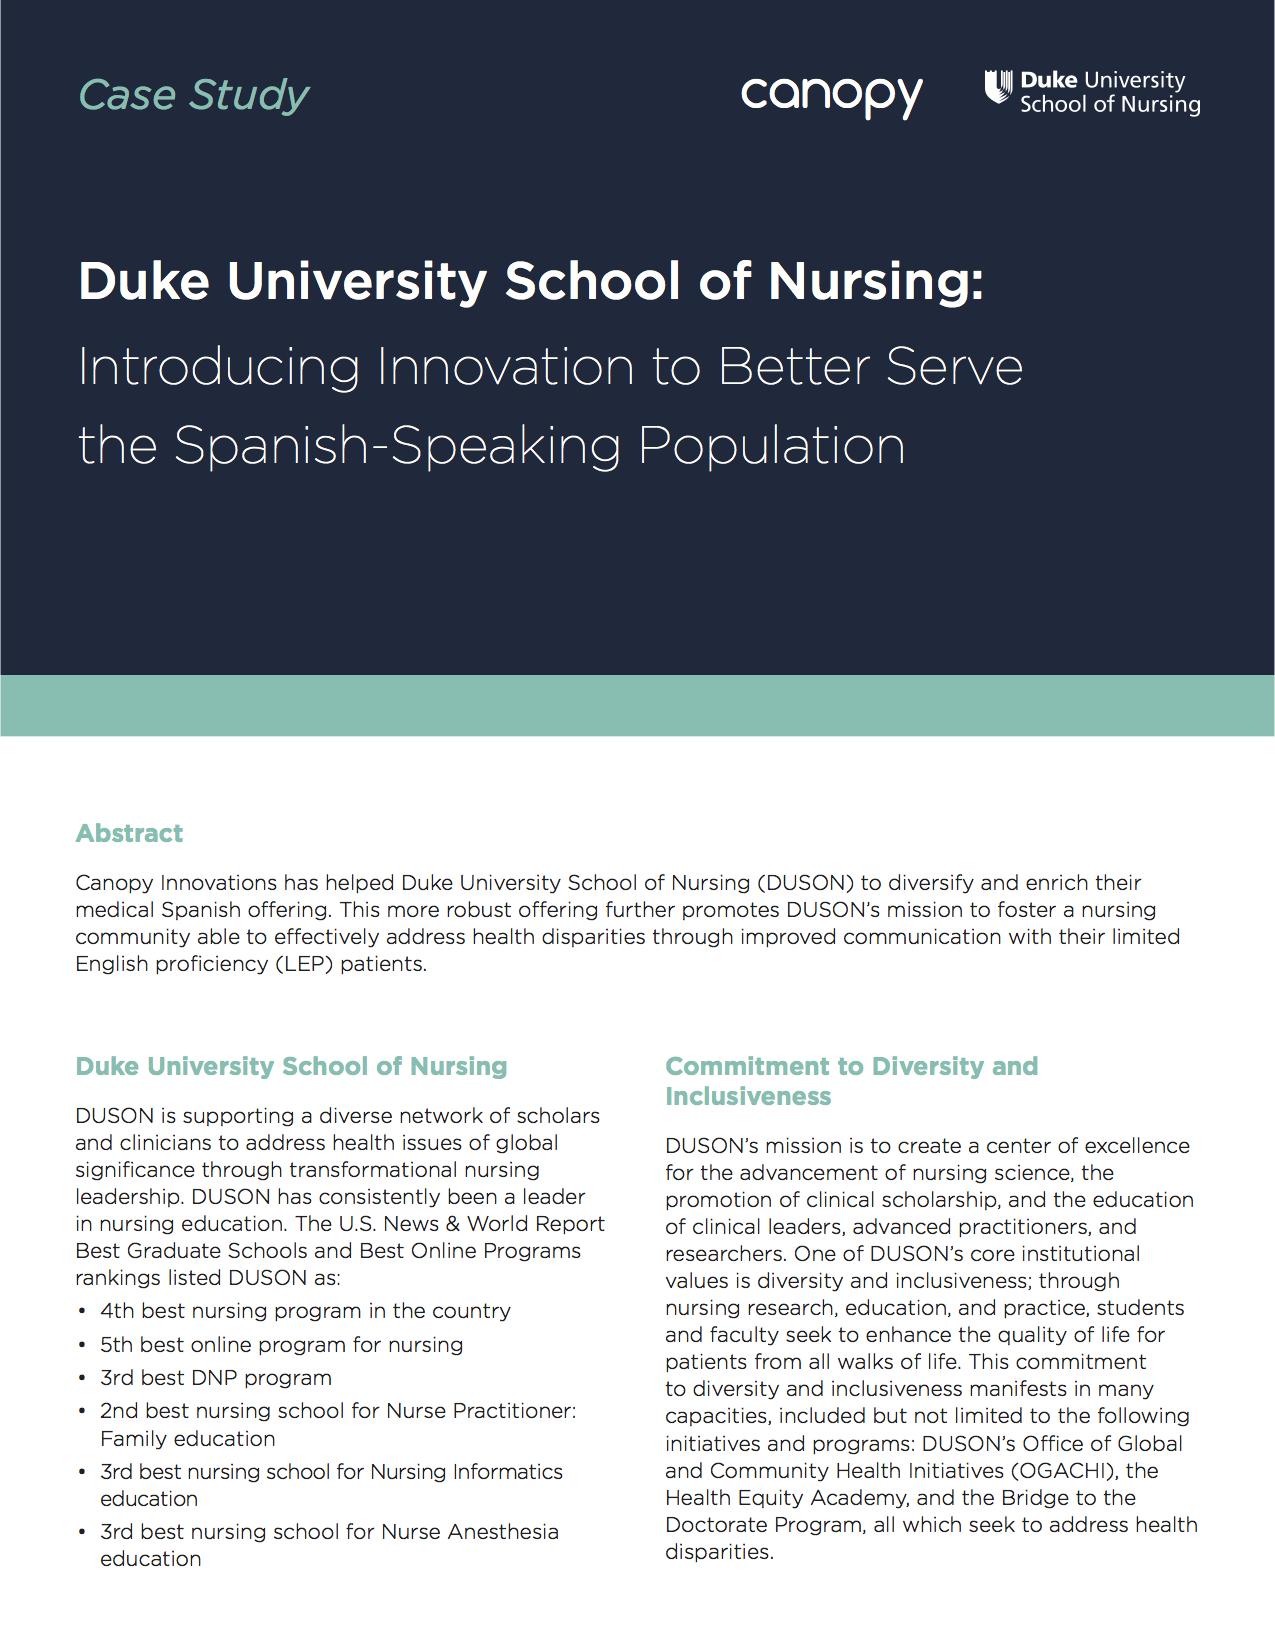 Duke University School of Nursing Uses Innovative Tactics to Better